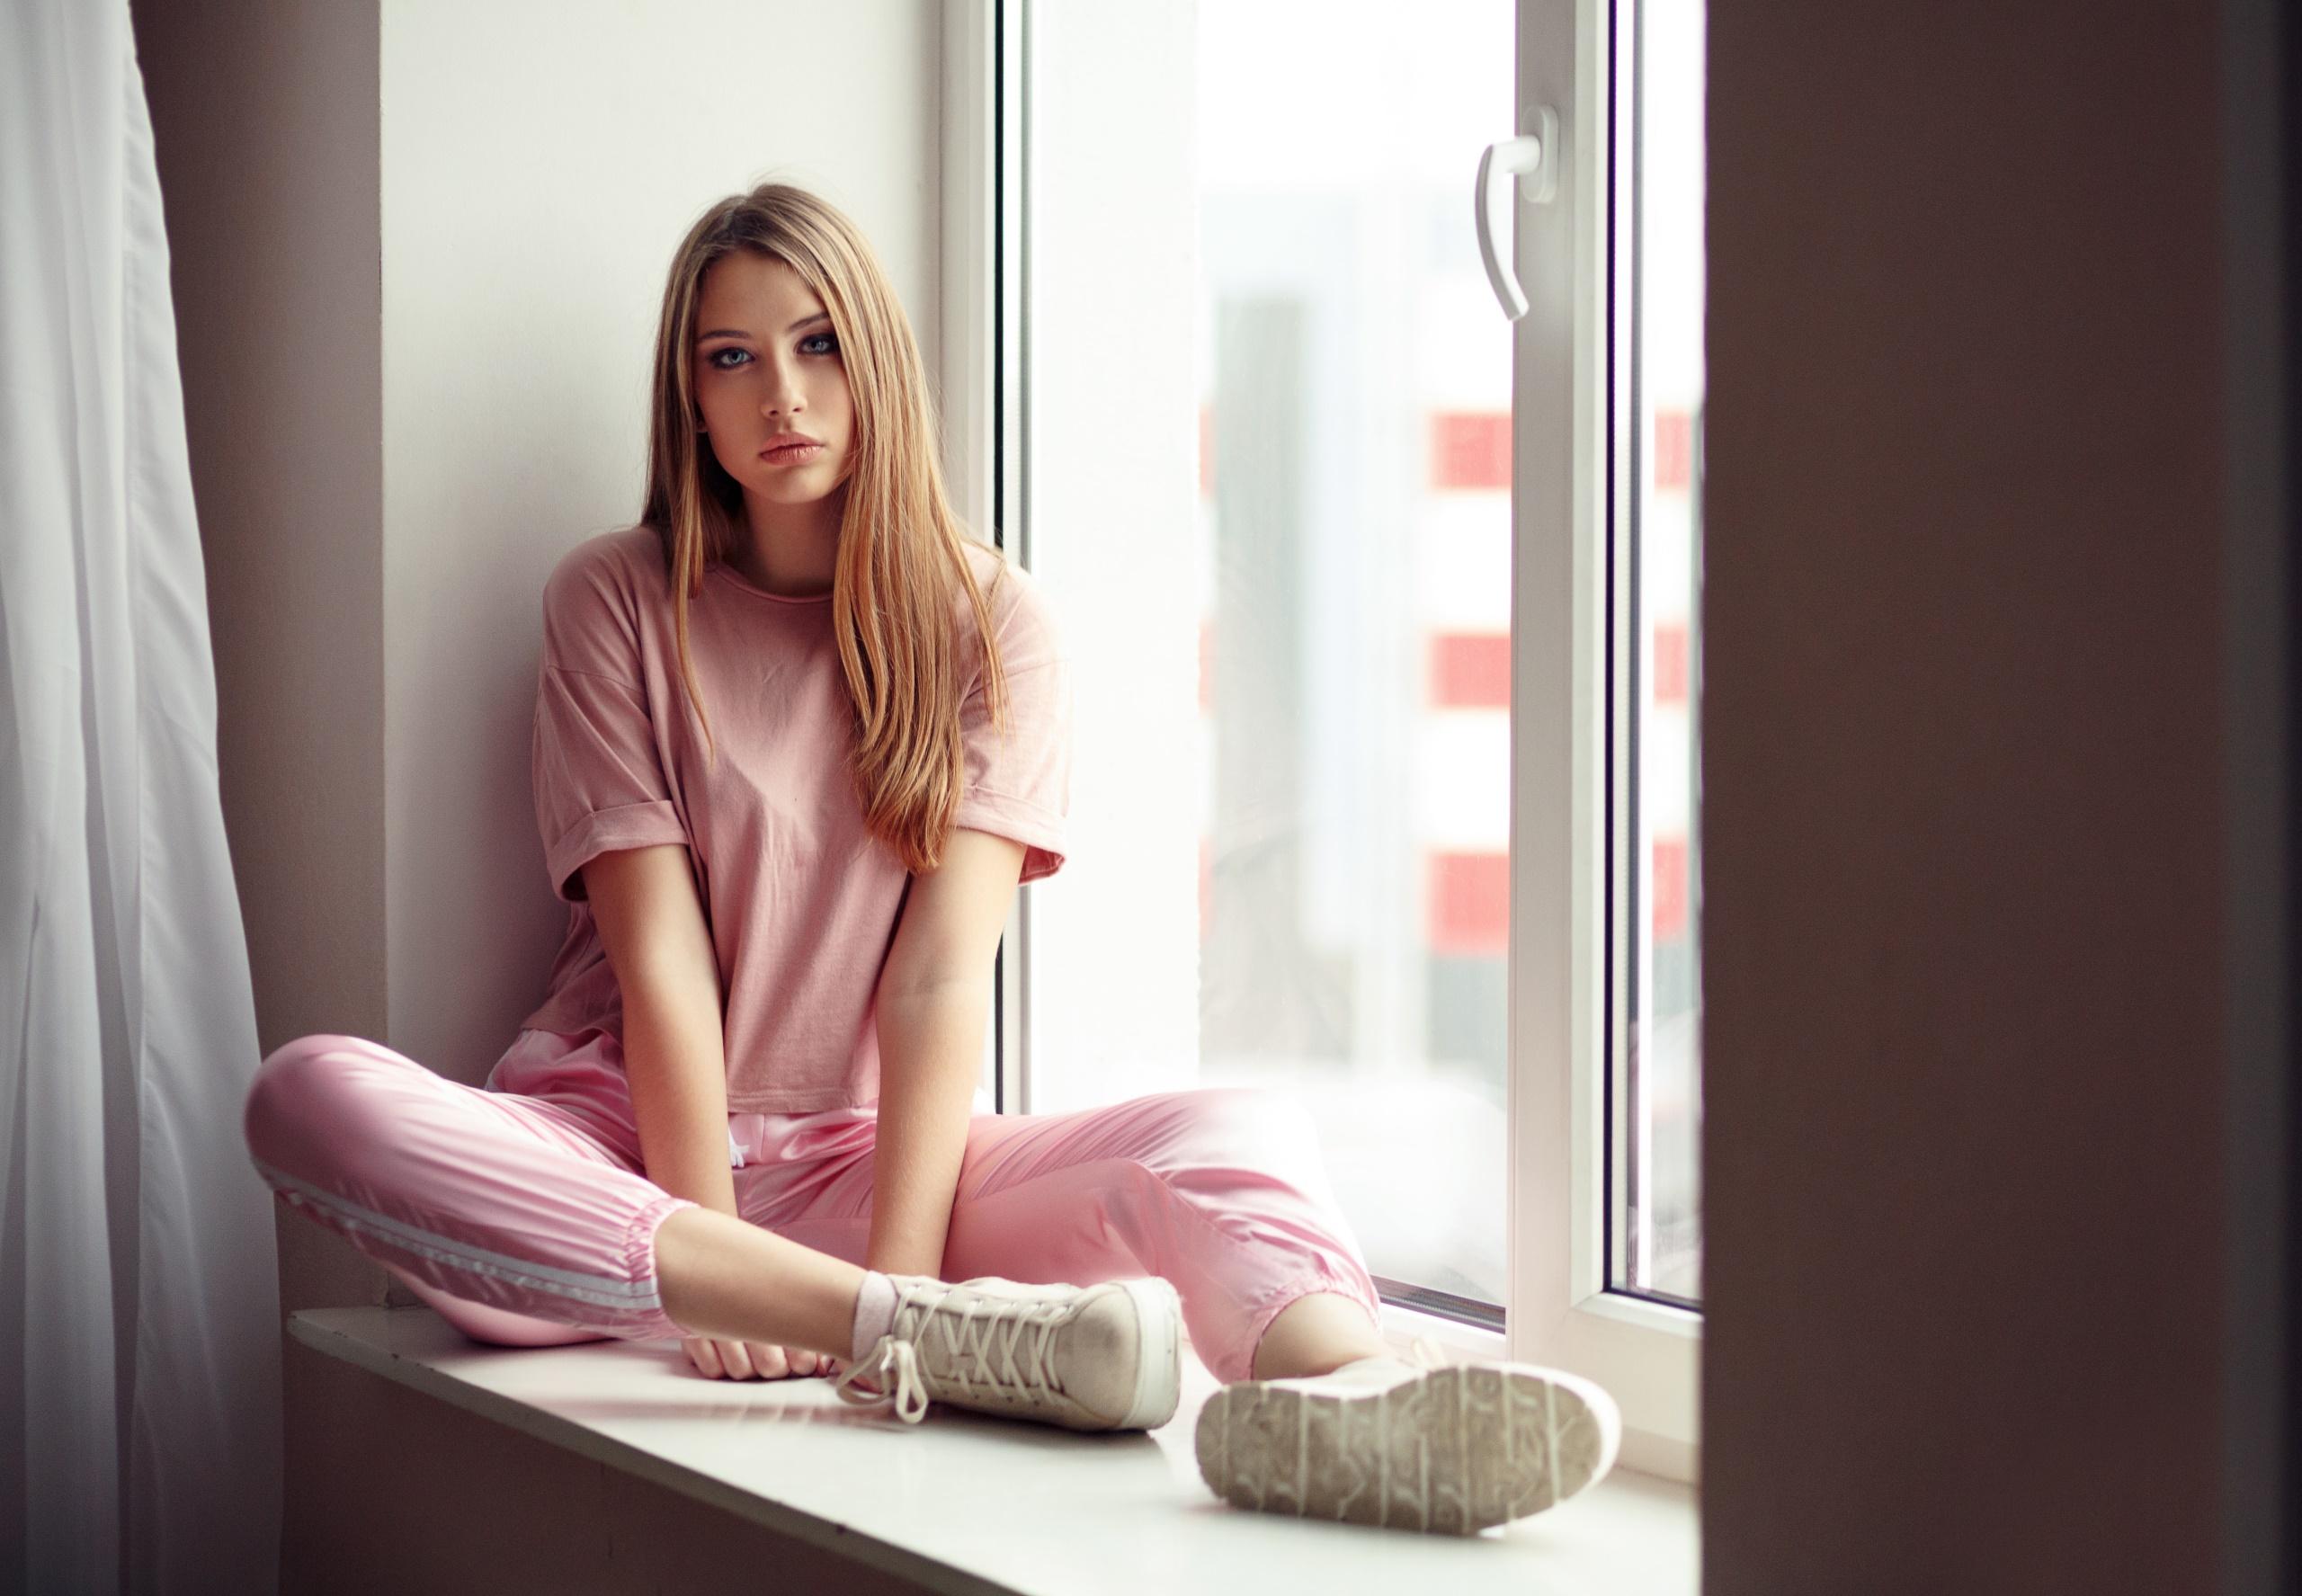 Wallpaper Women Model Sitting Window Evgeniy Bulatov